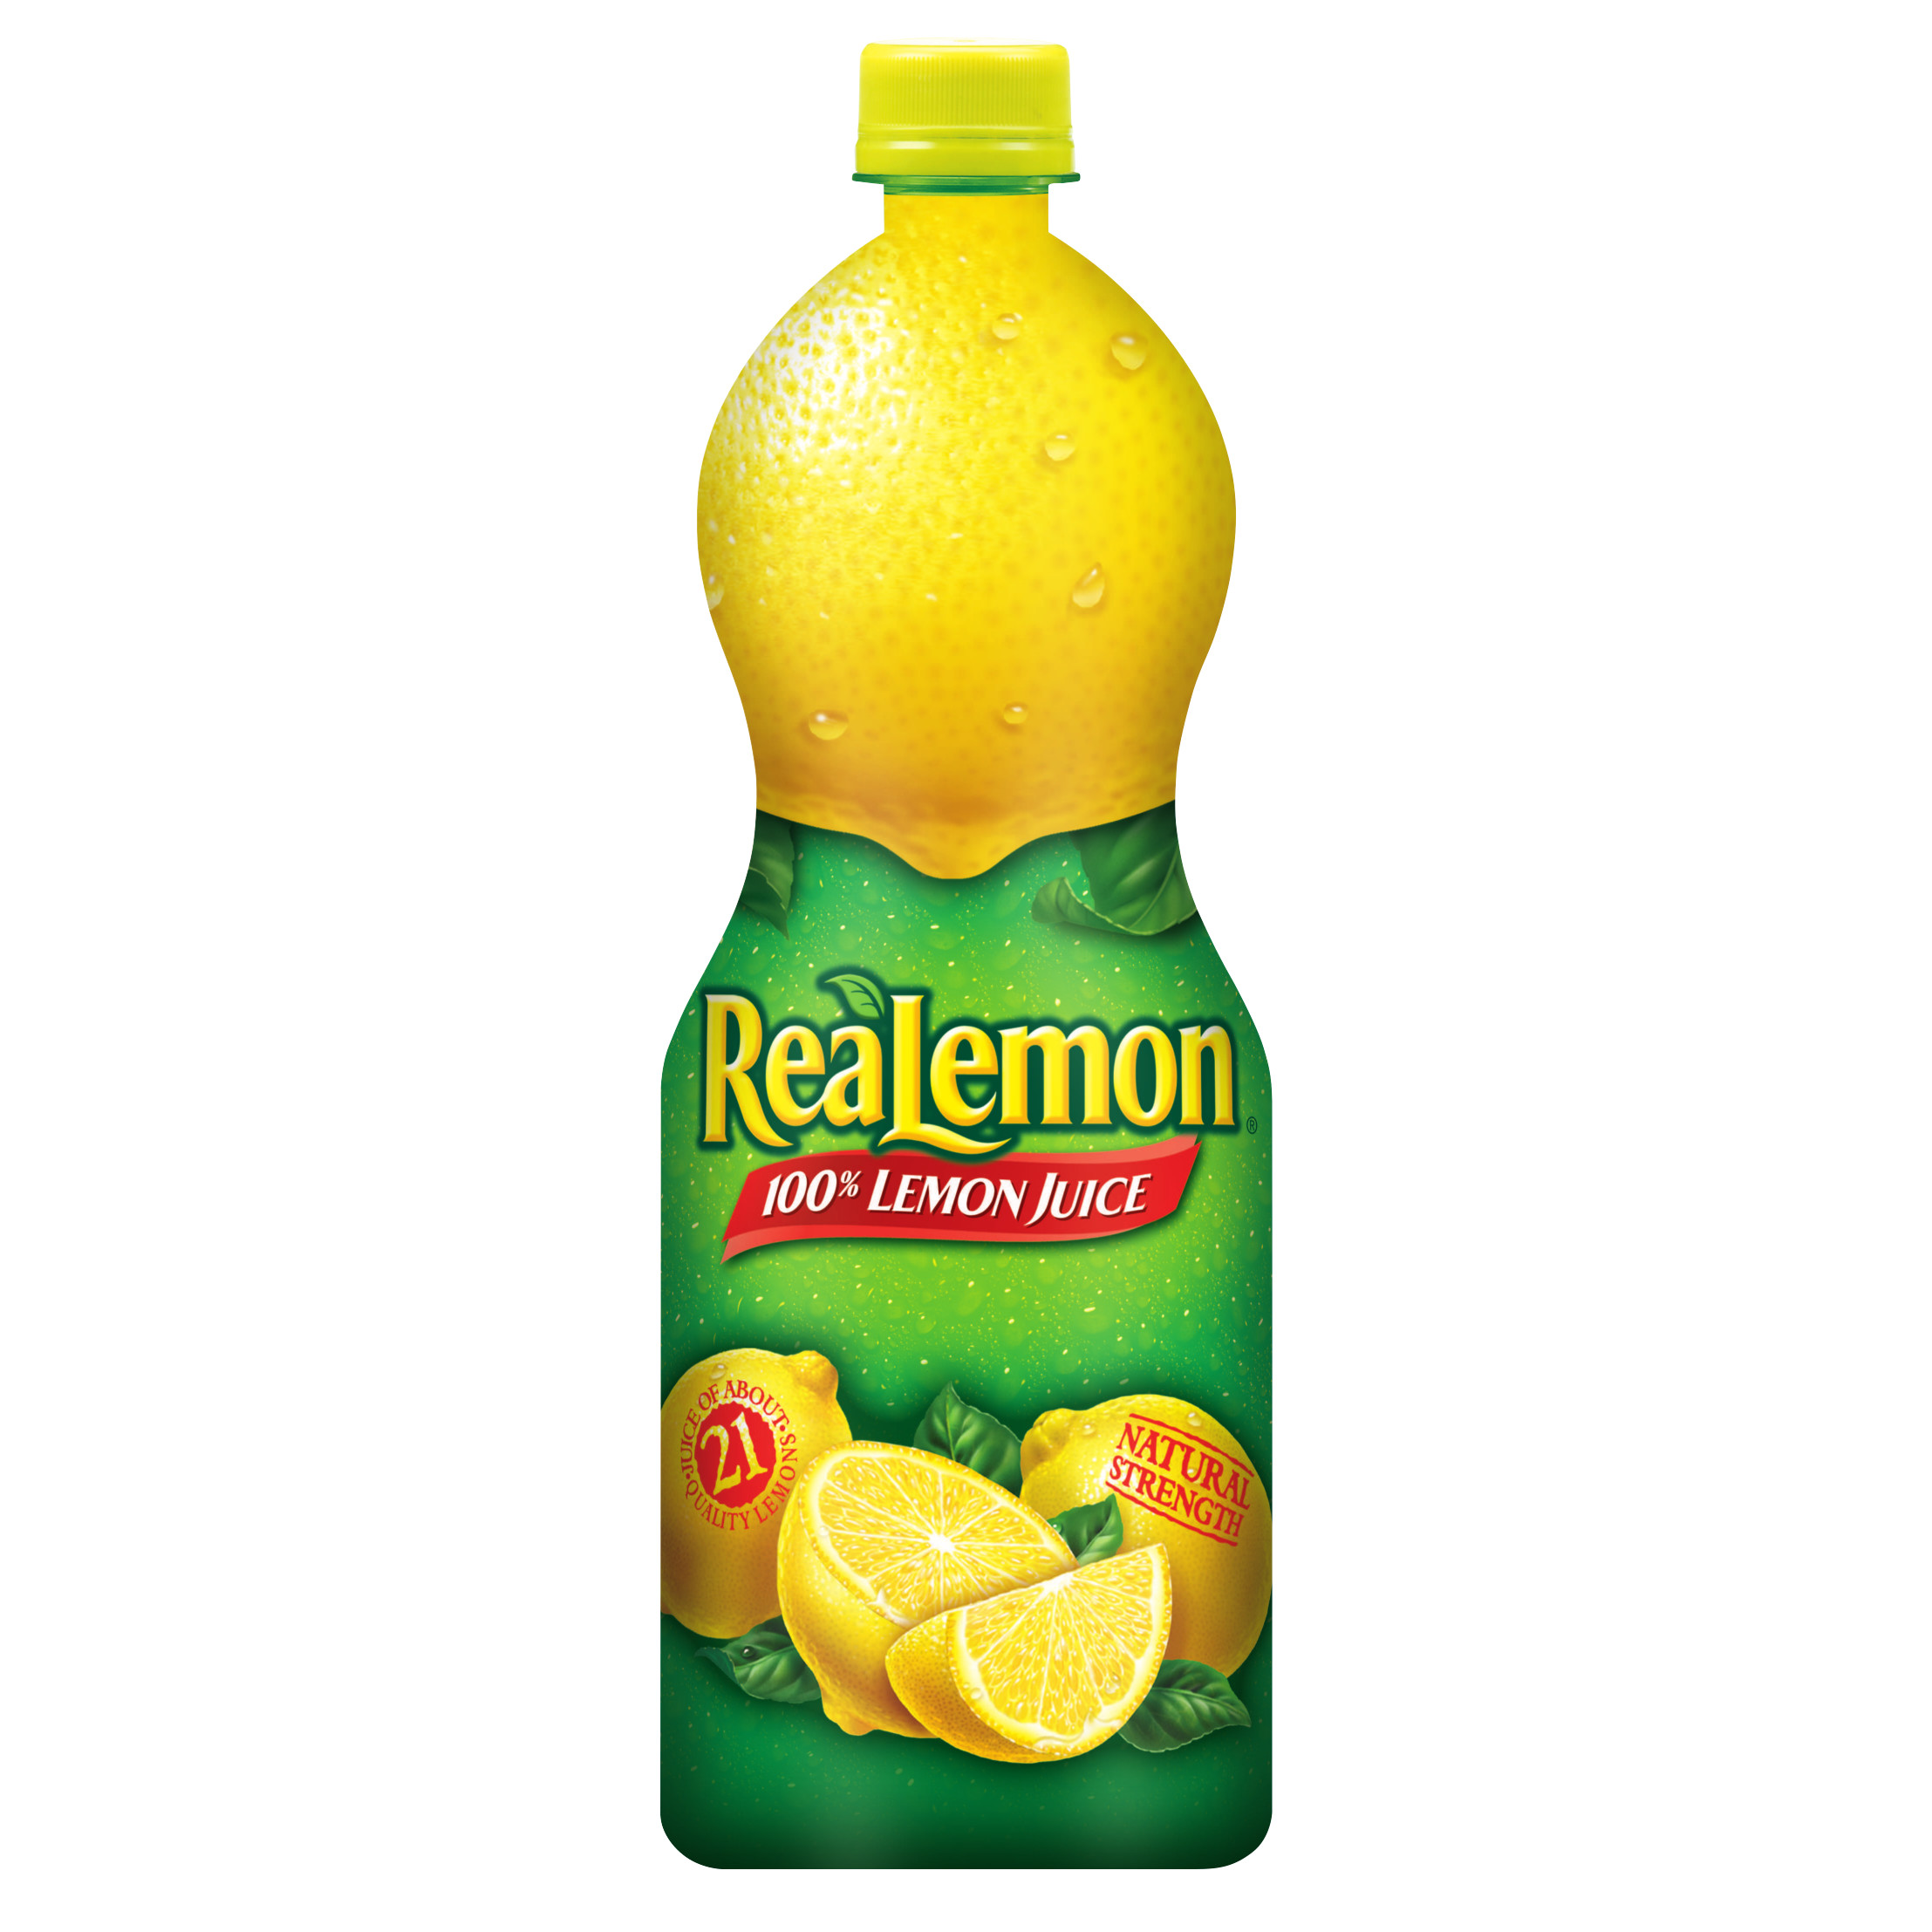 (3 pack) ReaLemon 100% Lemon Juice, 32 Fl Oz, 1 Count